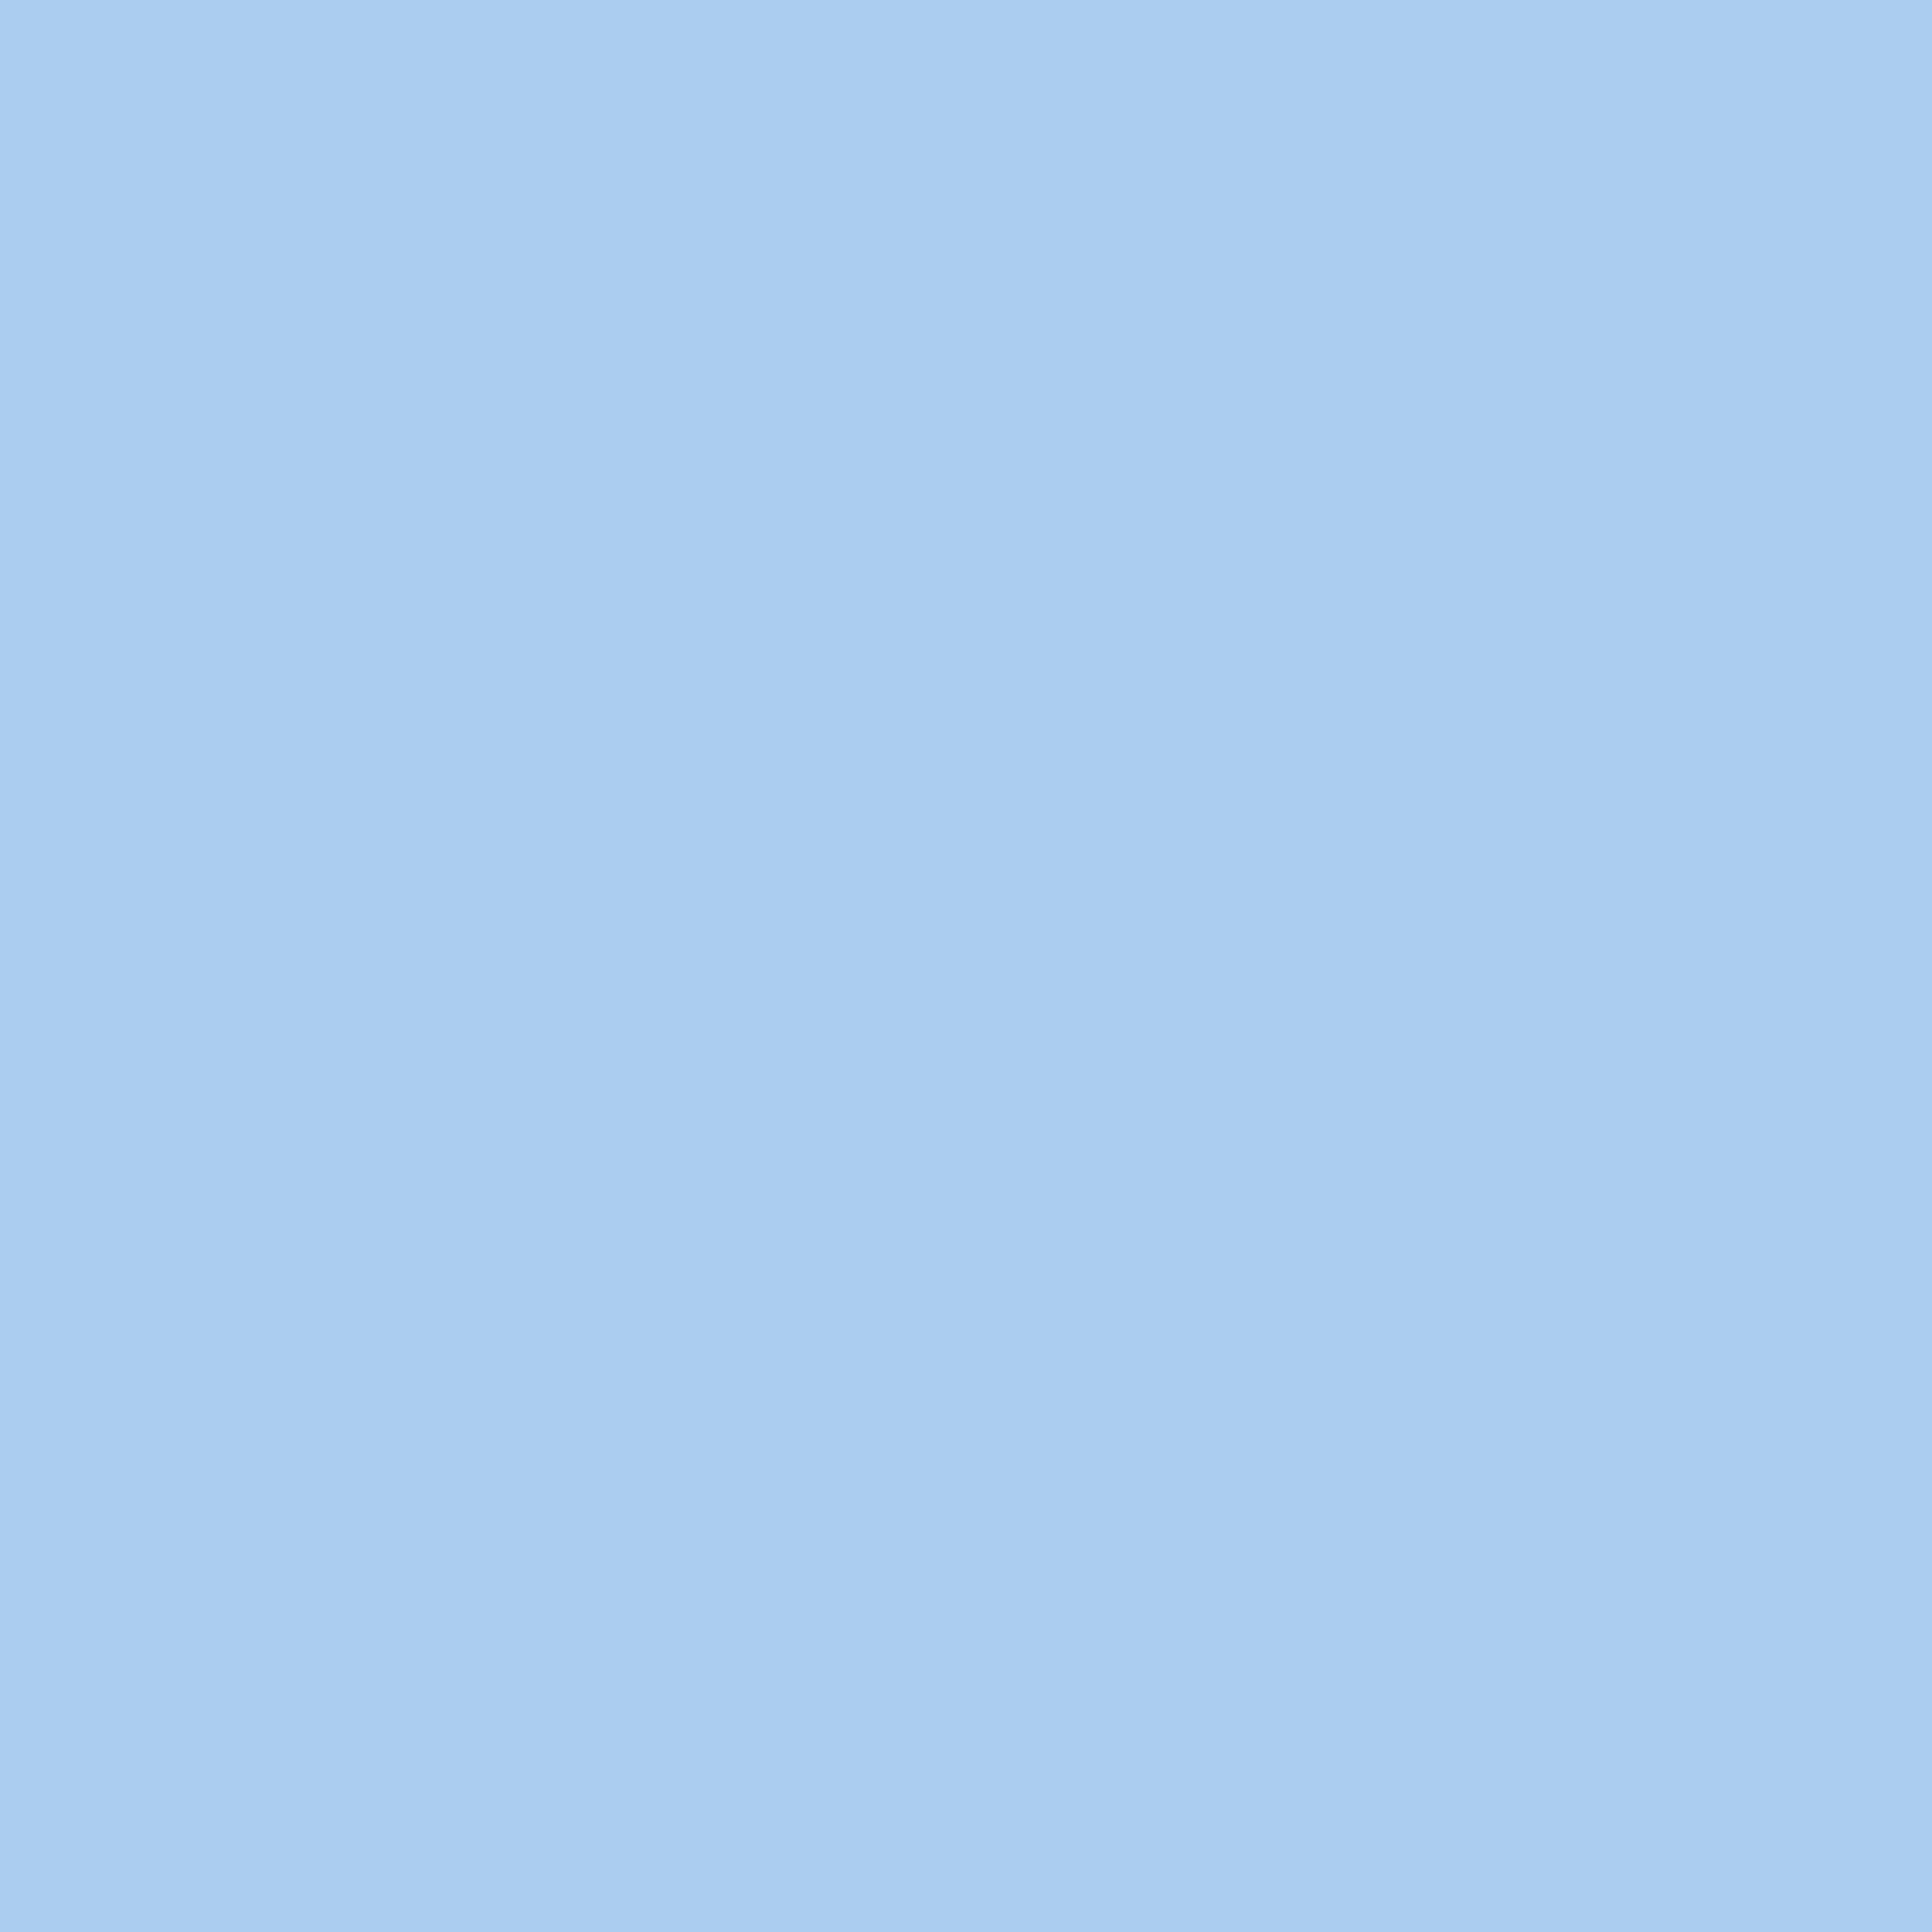 2732x2732 Pale Cornflower Blue Solid Color Background